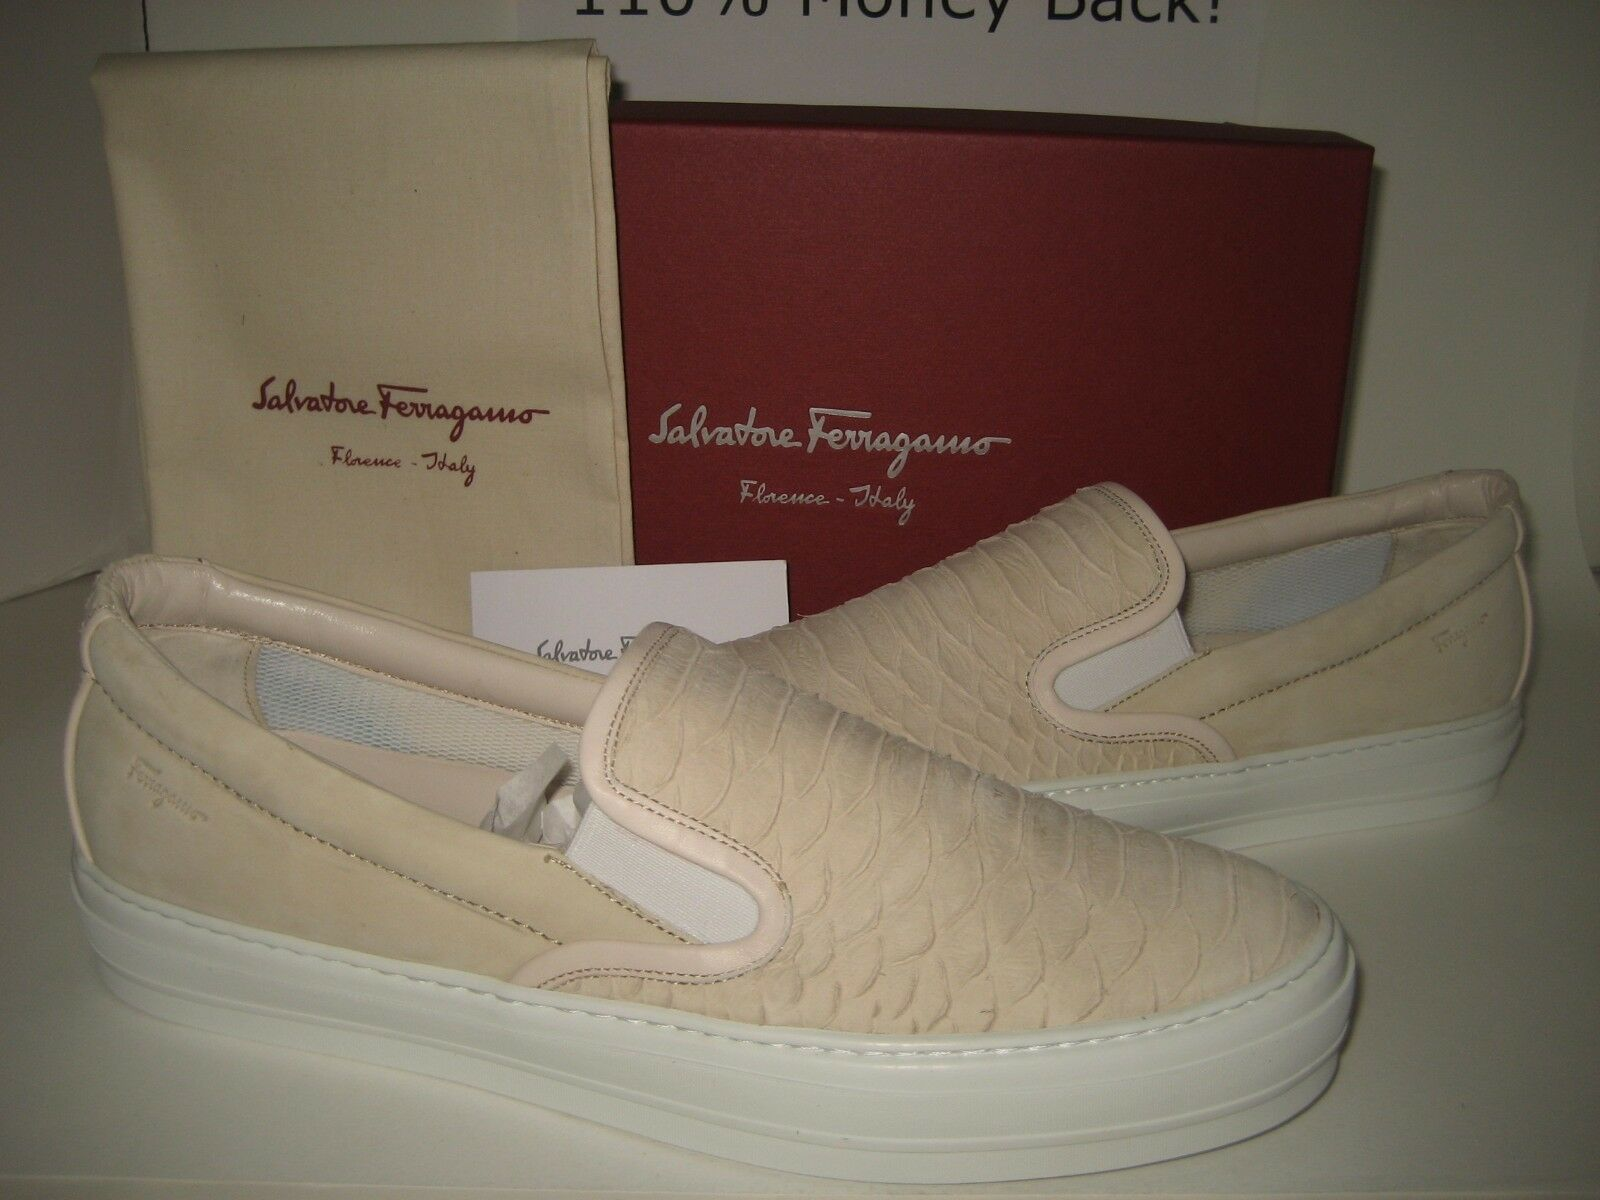 450 NEW Salvatore Ferragamo Women US 9.5 Pacau Suede Leather Sneakers shoes BOX